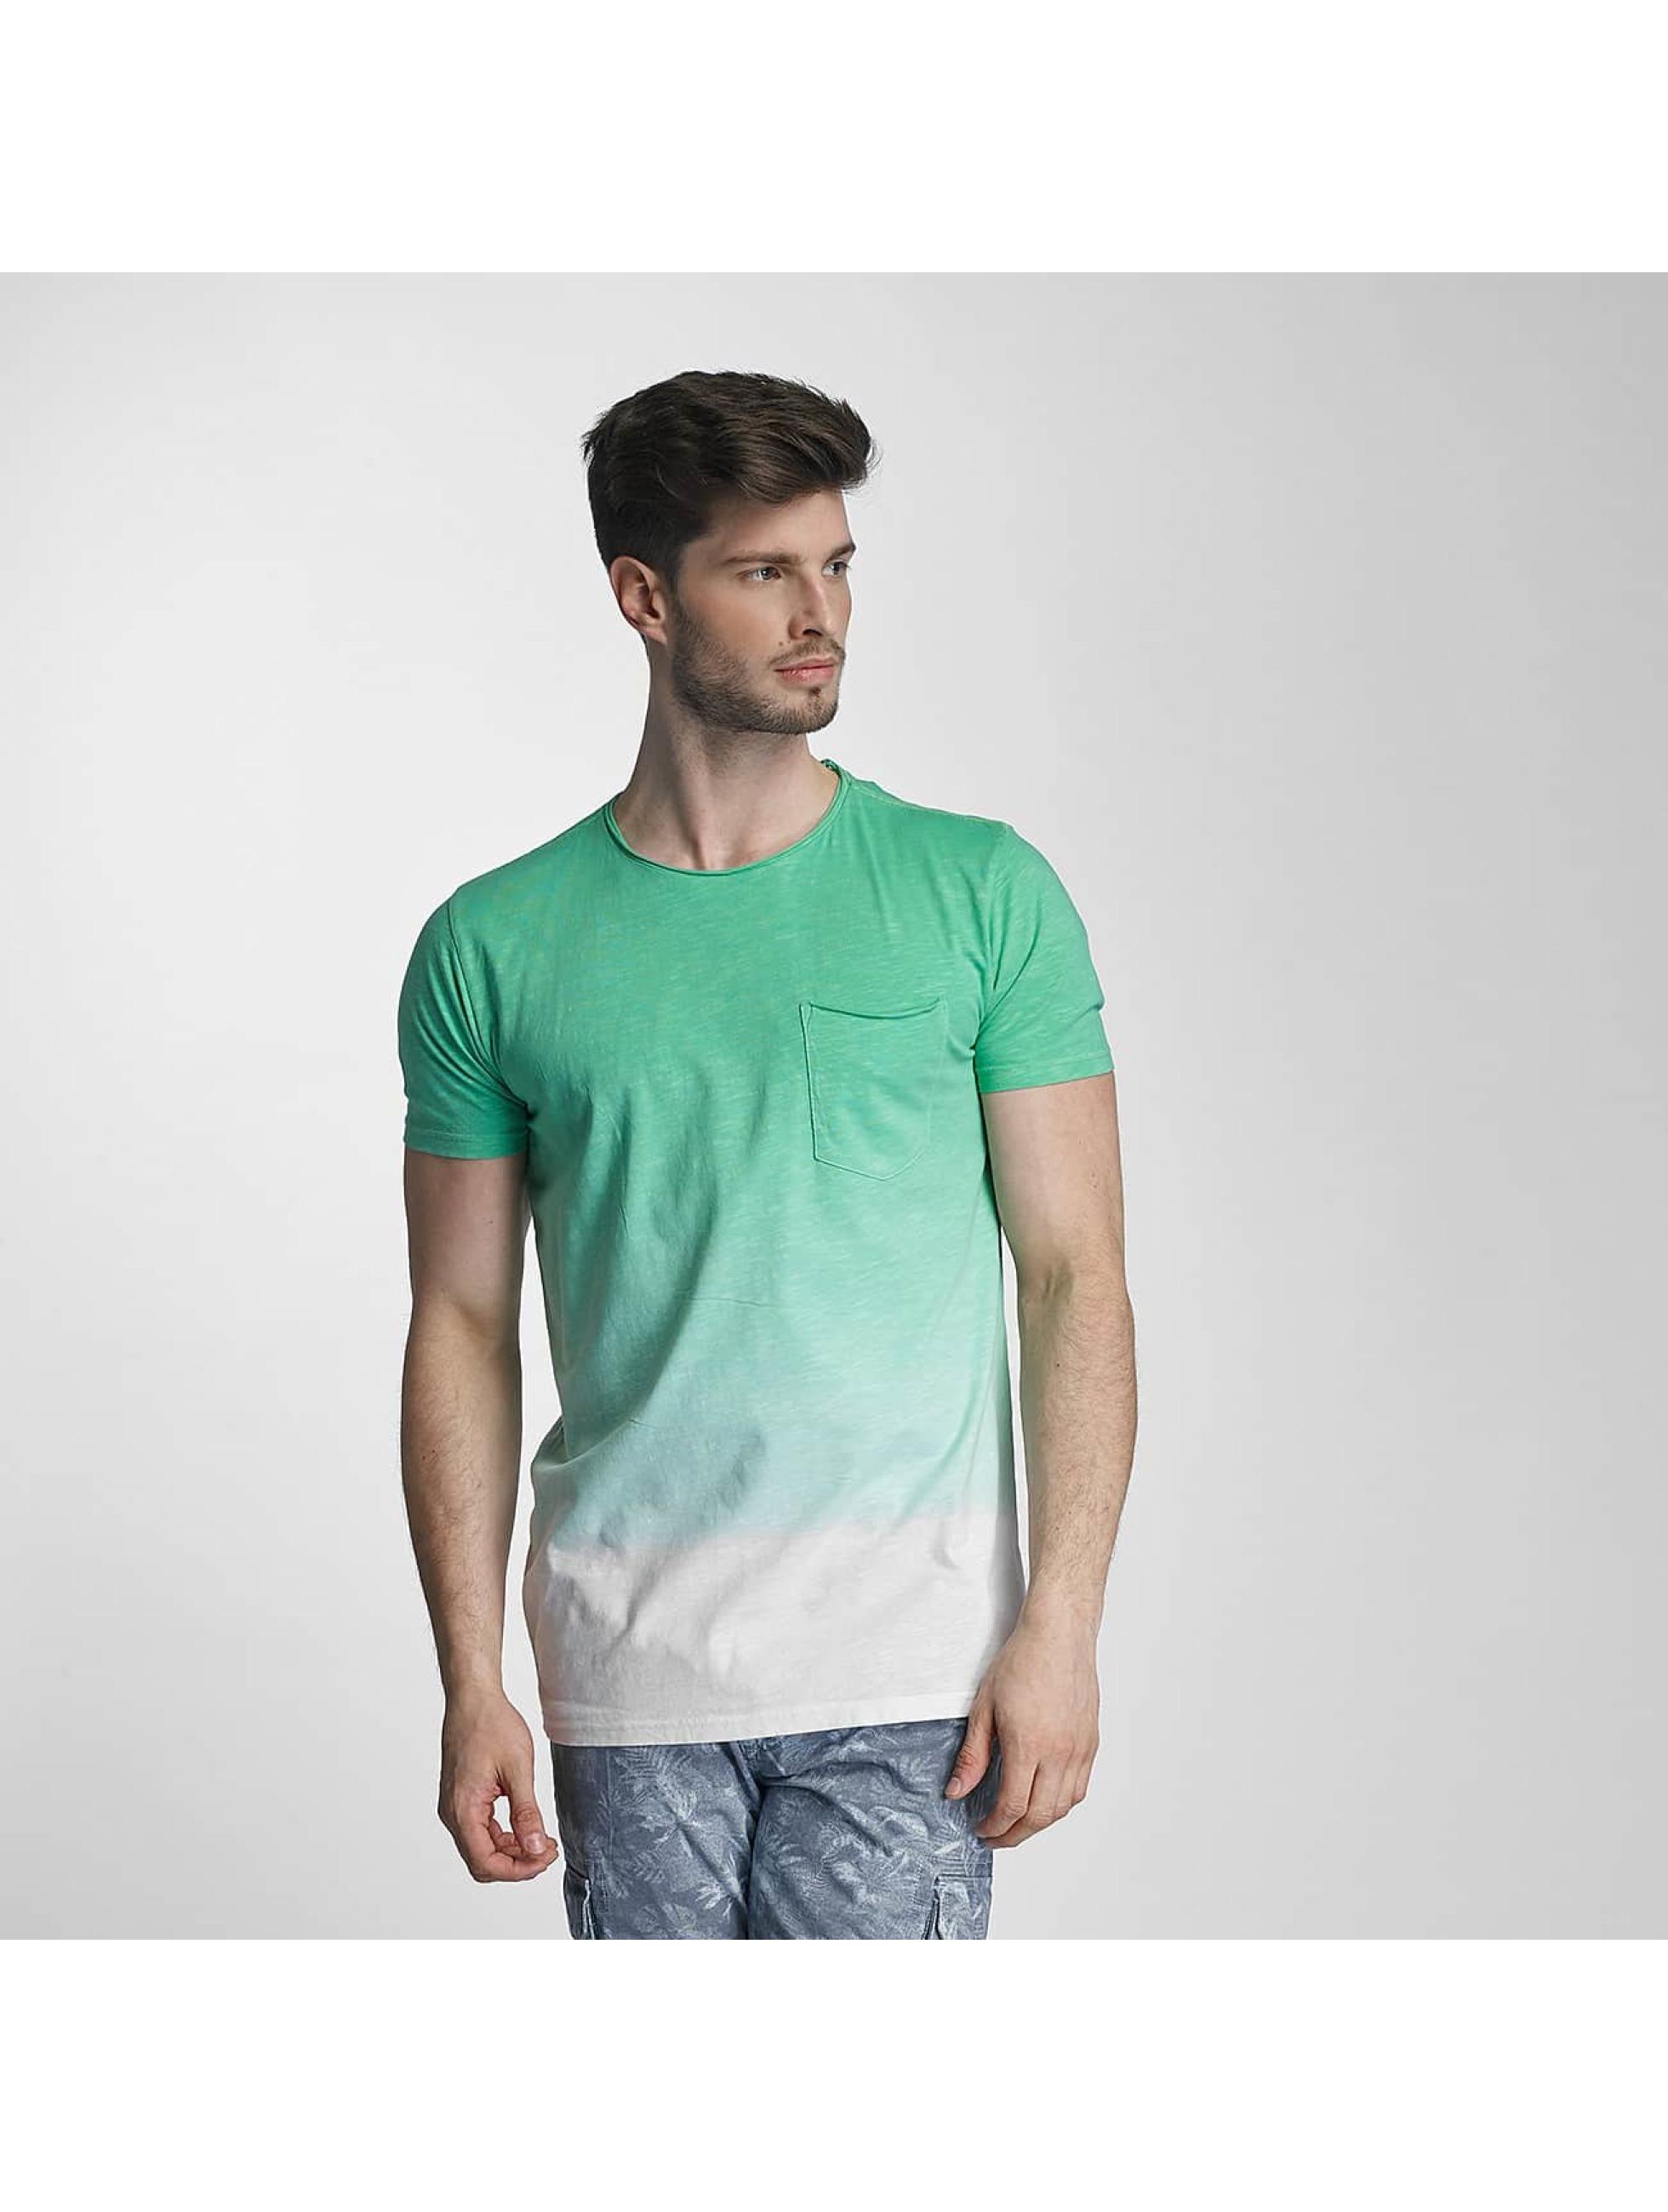 SHINE Original Männer T-Shirt Dip Dyed in grün